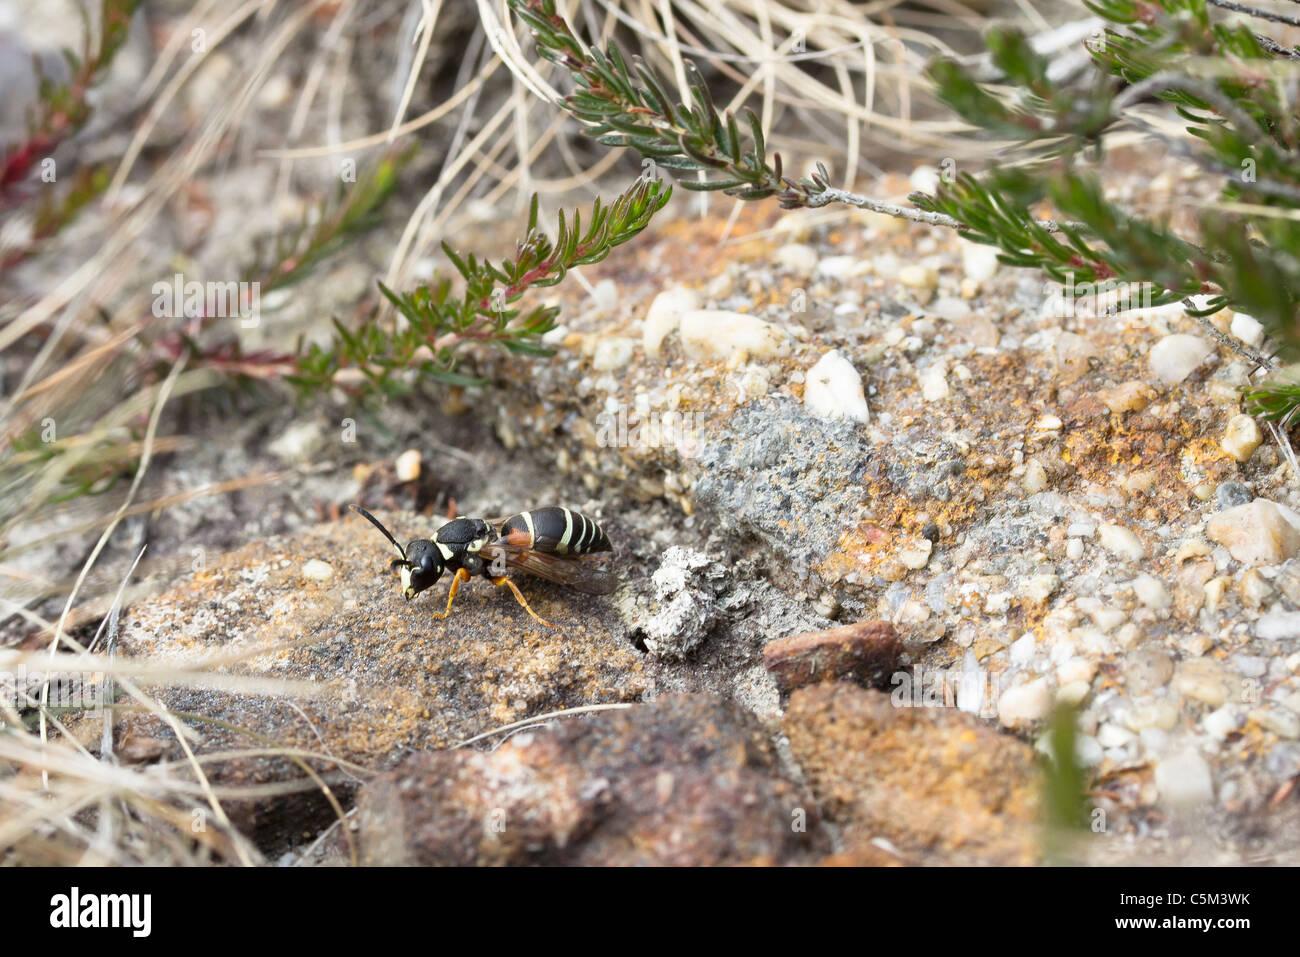 The rare Purbeck mason wasp (Pseudepipona herrichii). Stock Photo